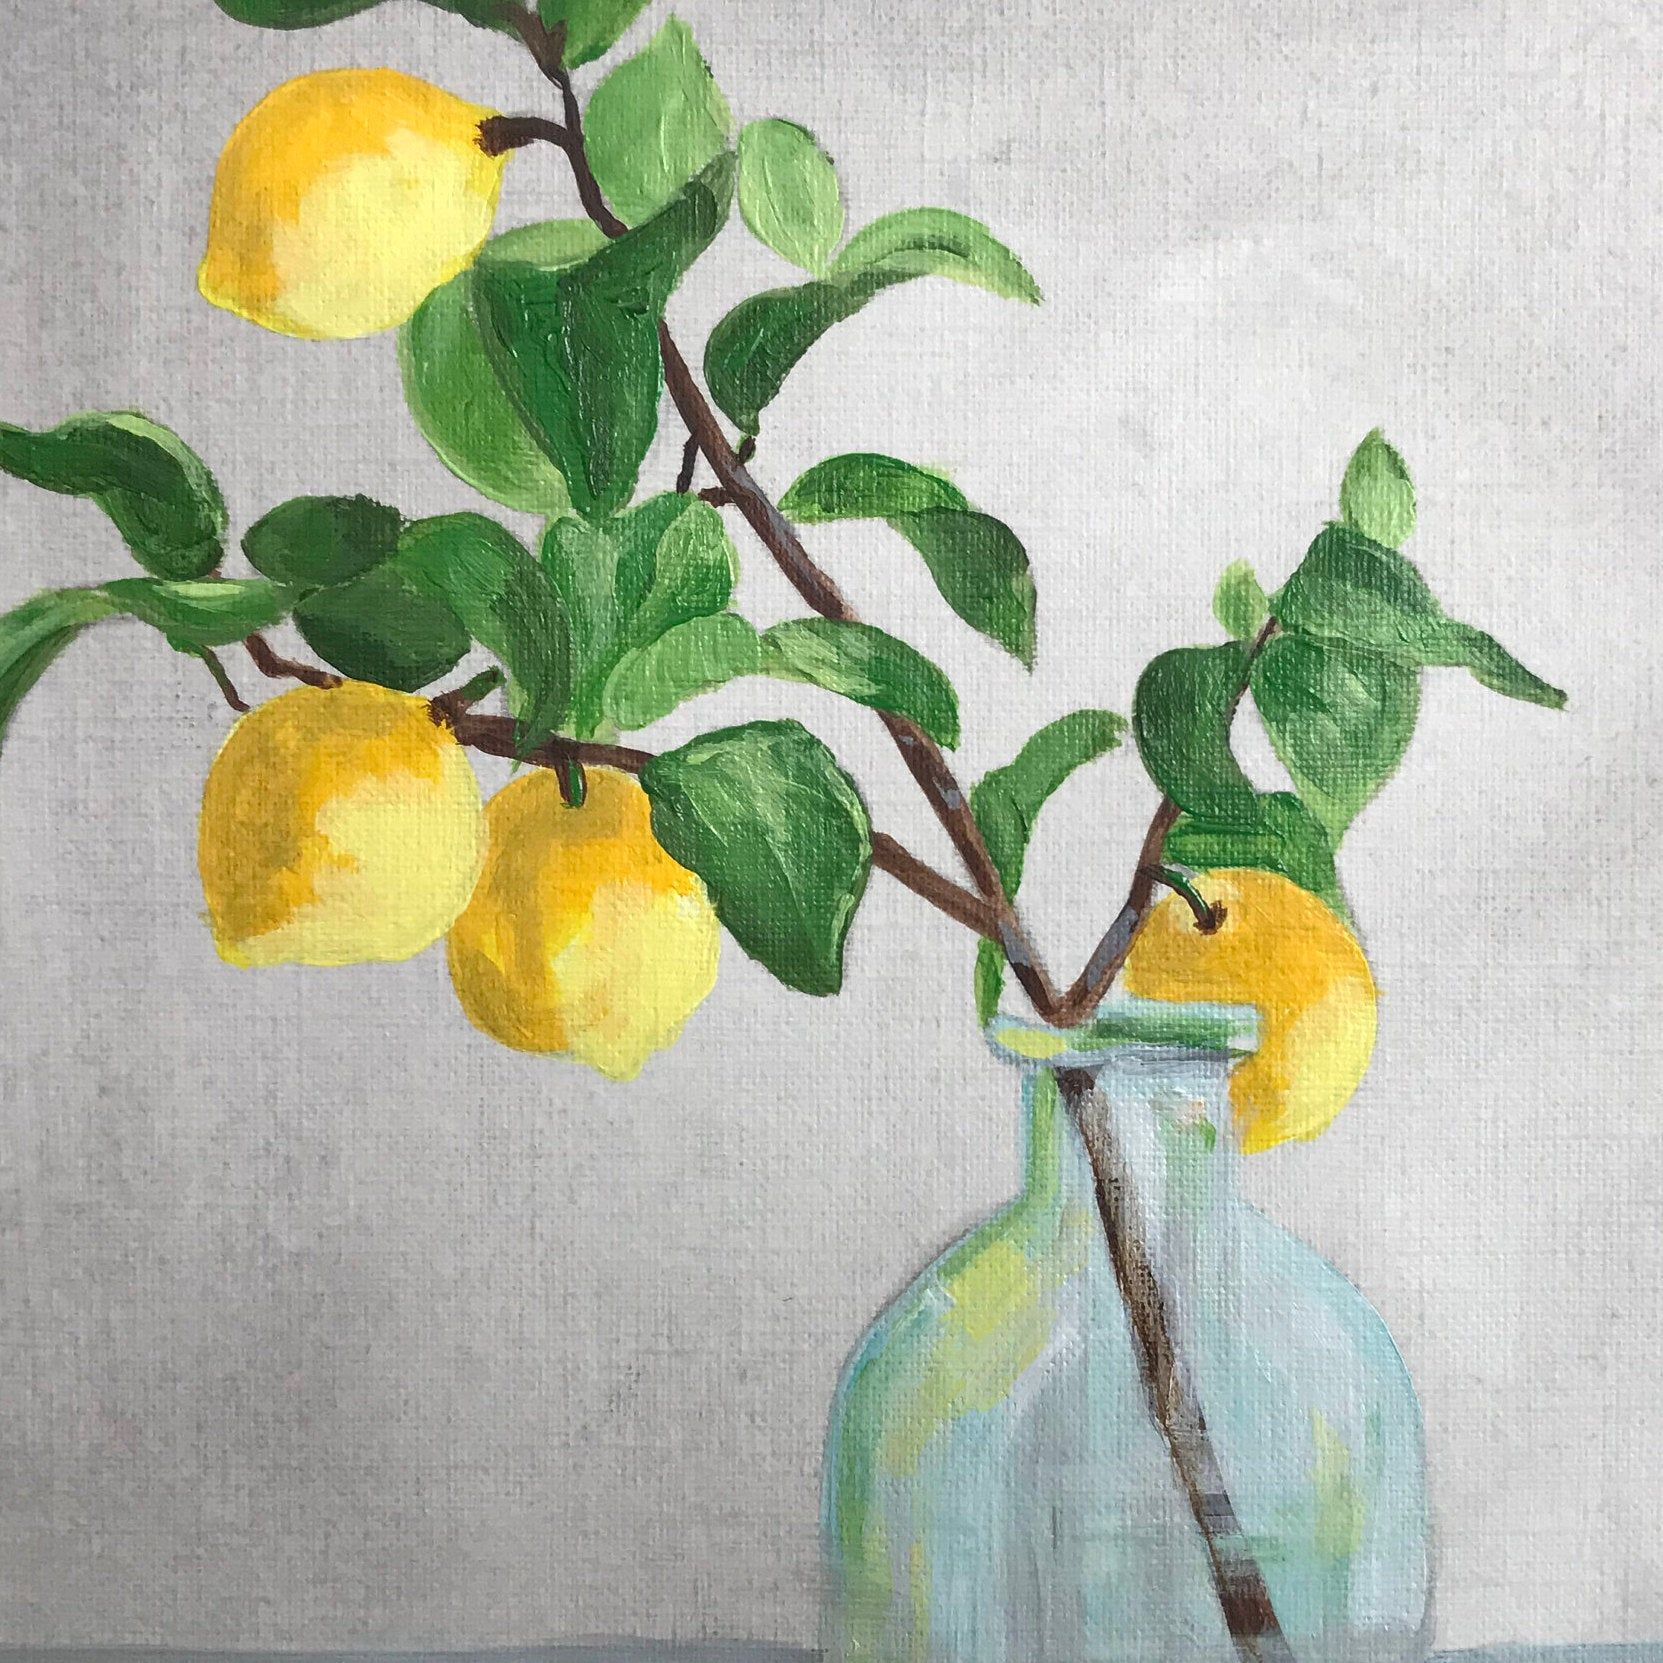 Lemon Branch Painting Art Print Large Contemporary Wall Art Etsy In 2020 Lemon Painting Acrylic Painting Inspiration Etsy Wall Art